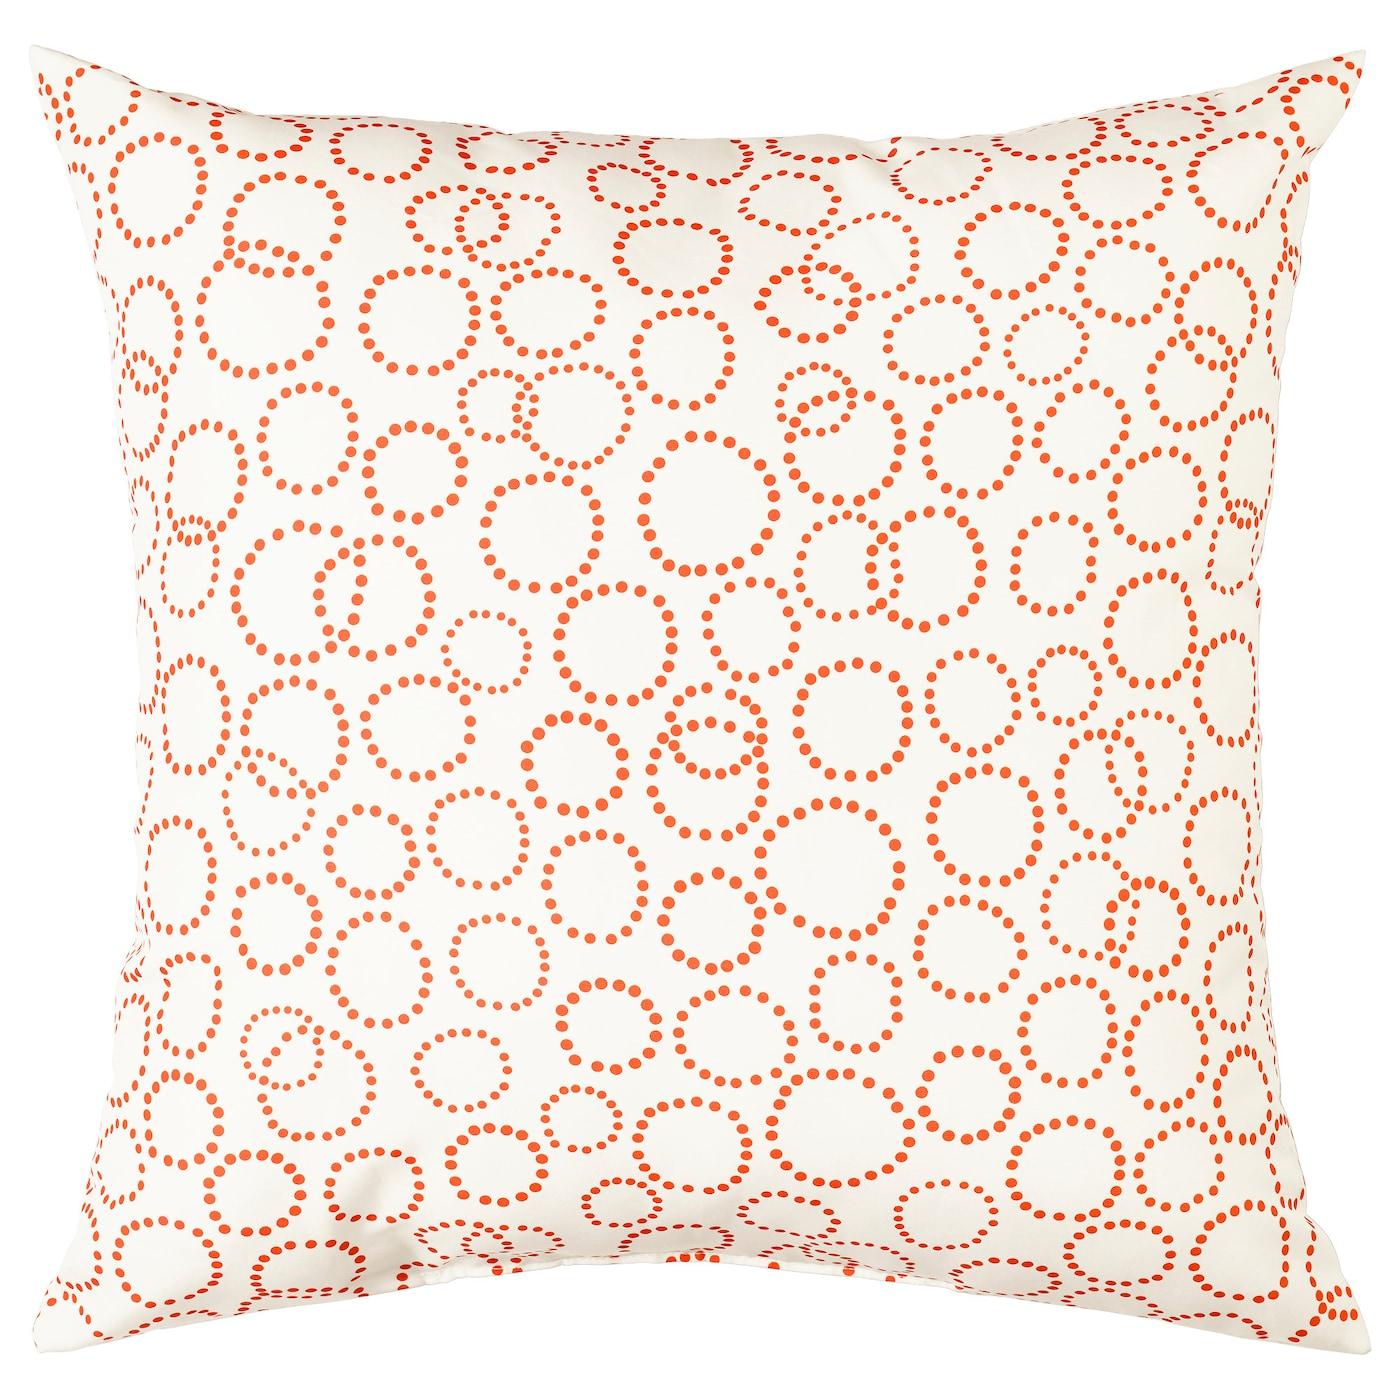 tr daster cushion white orange 40x40 cm ikea. Black Bedroom Furniture Sets. Home Design Ideas